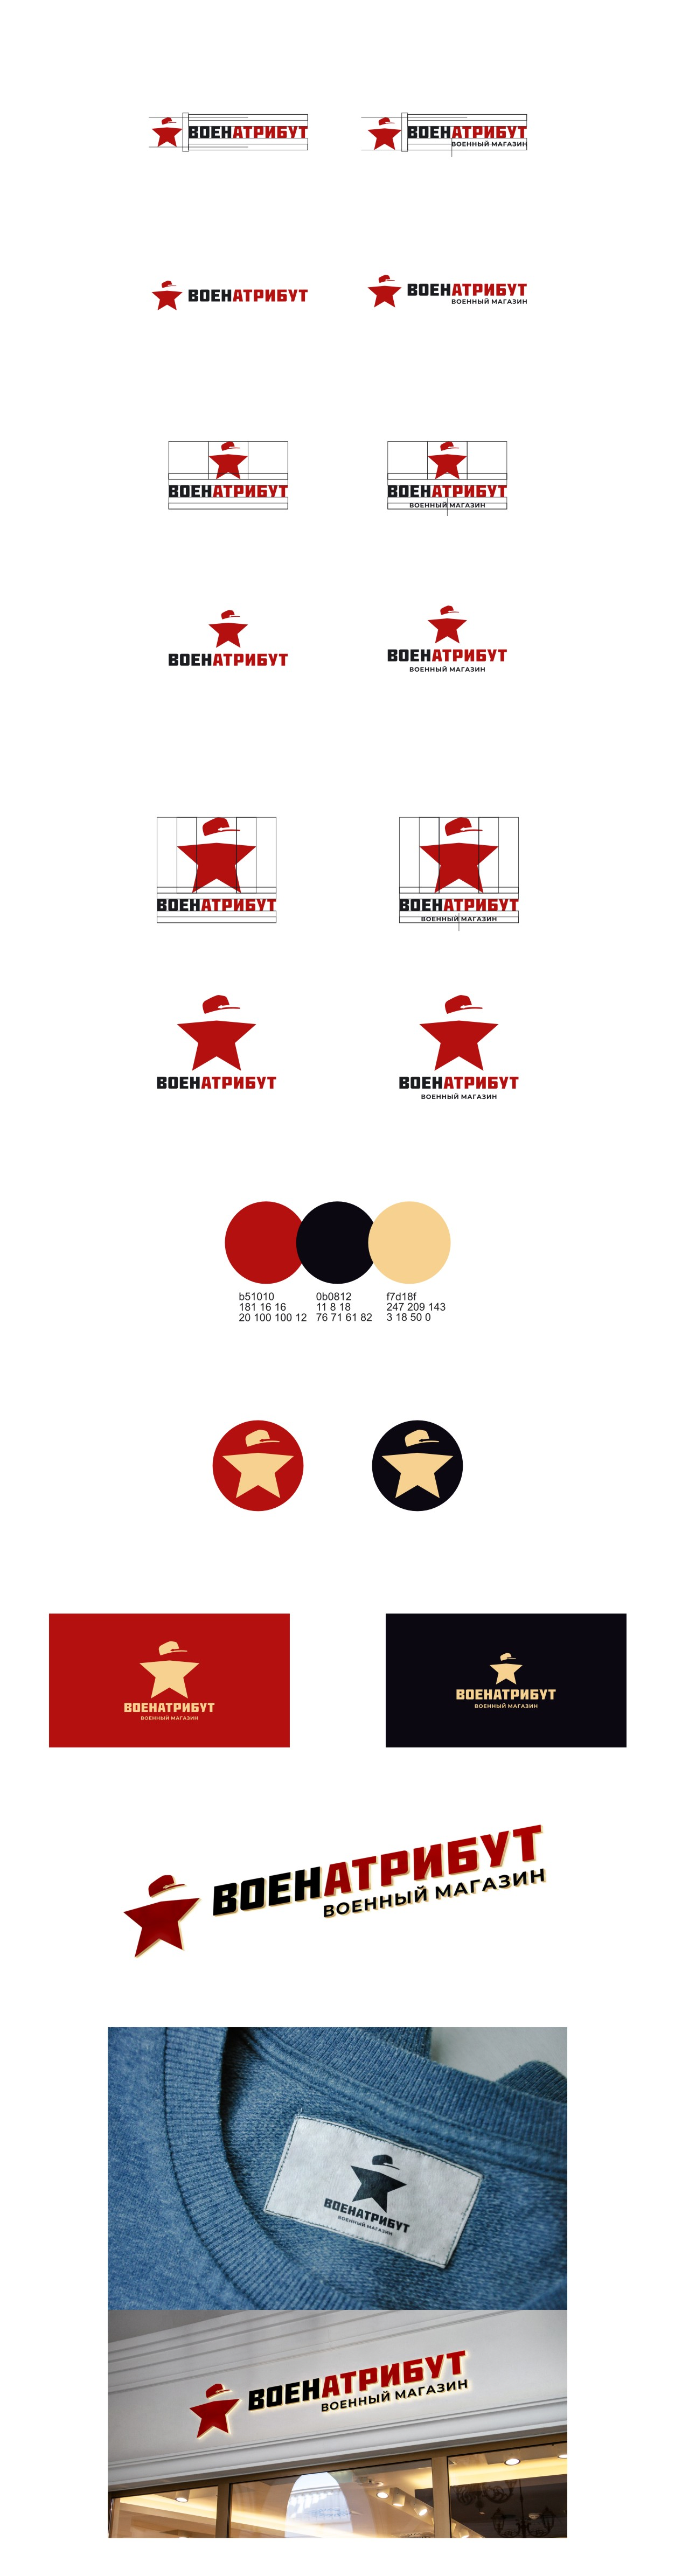 Разработка логотипа для компании военной тематики фото f_361601d8f03212cf.jpg